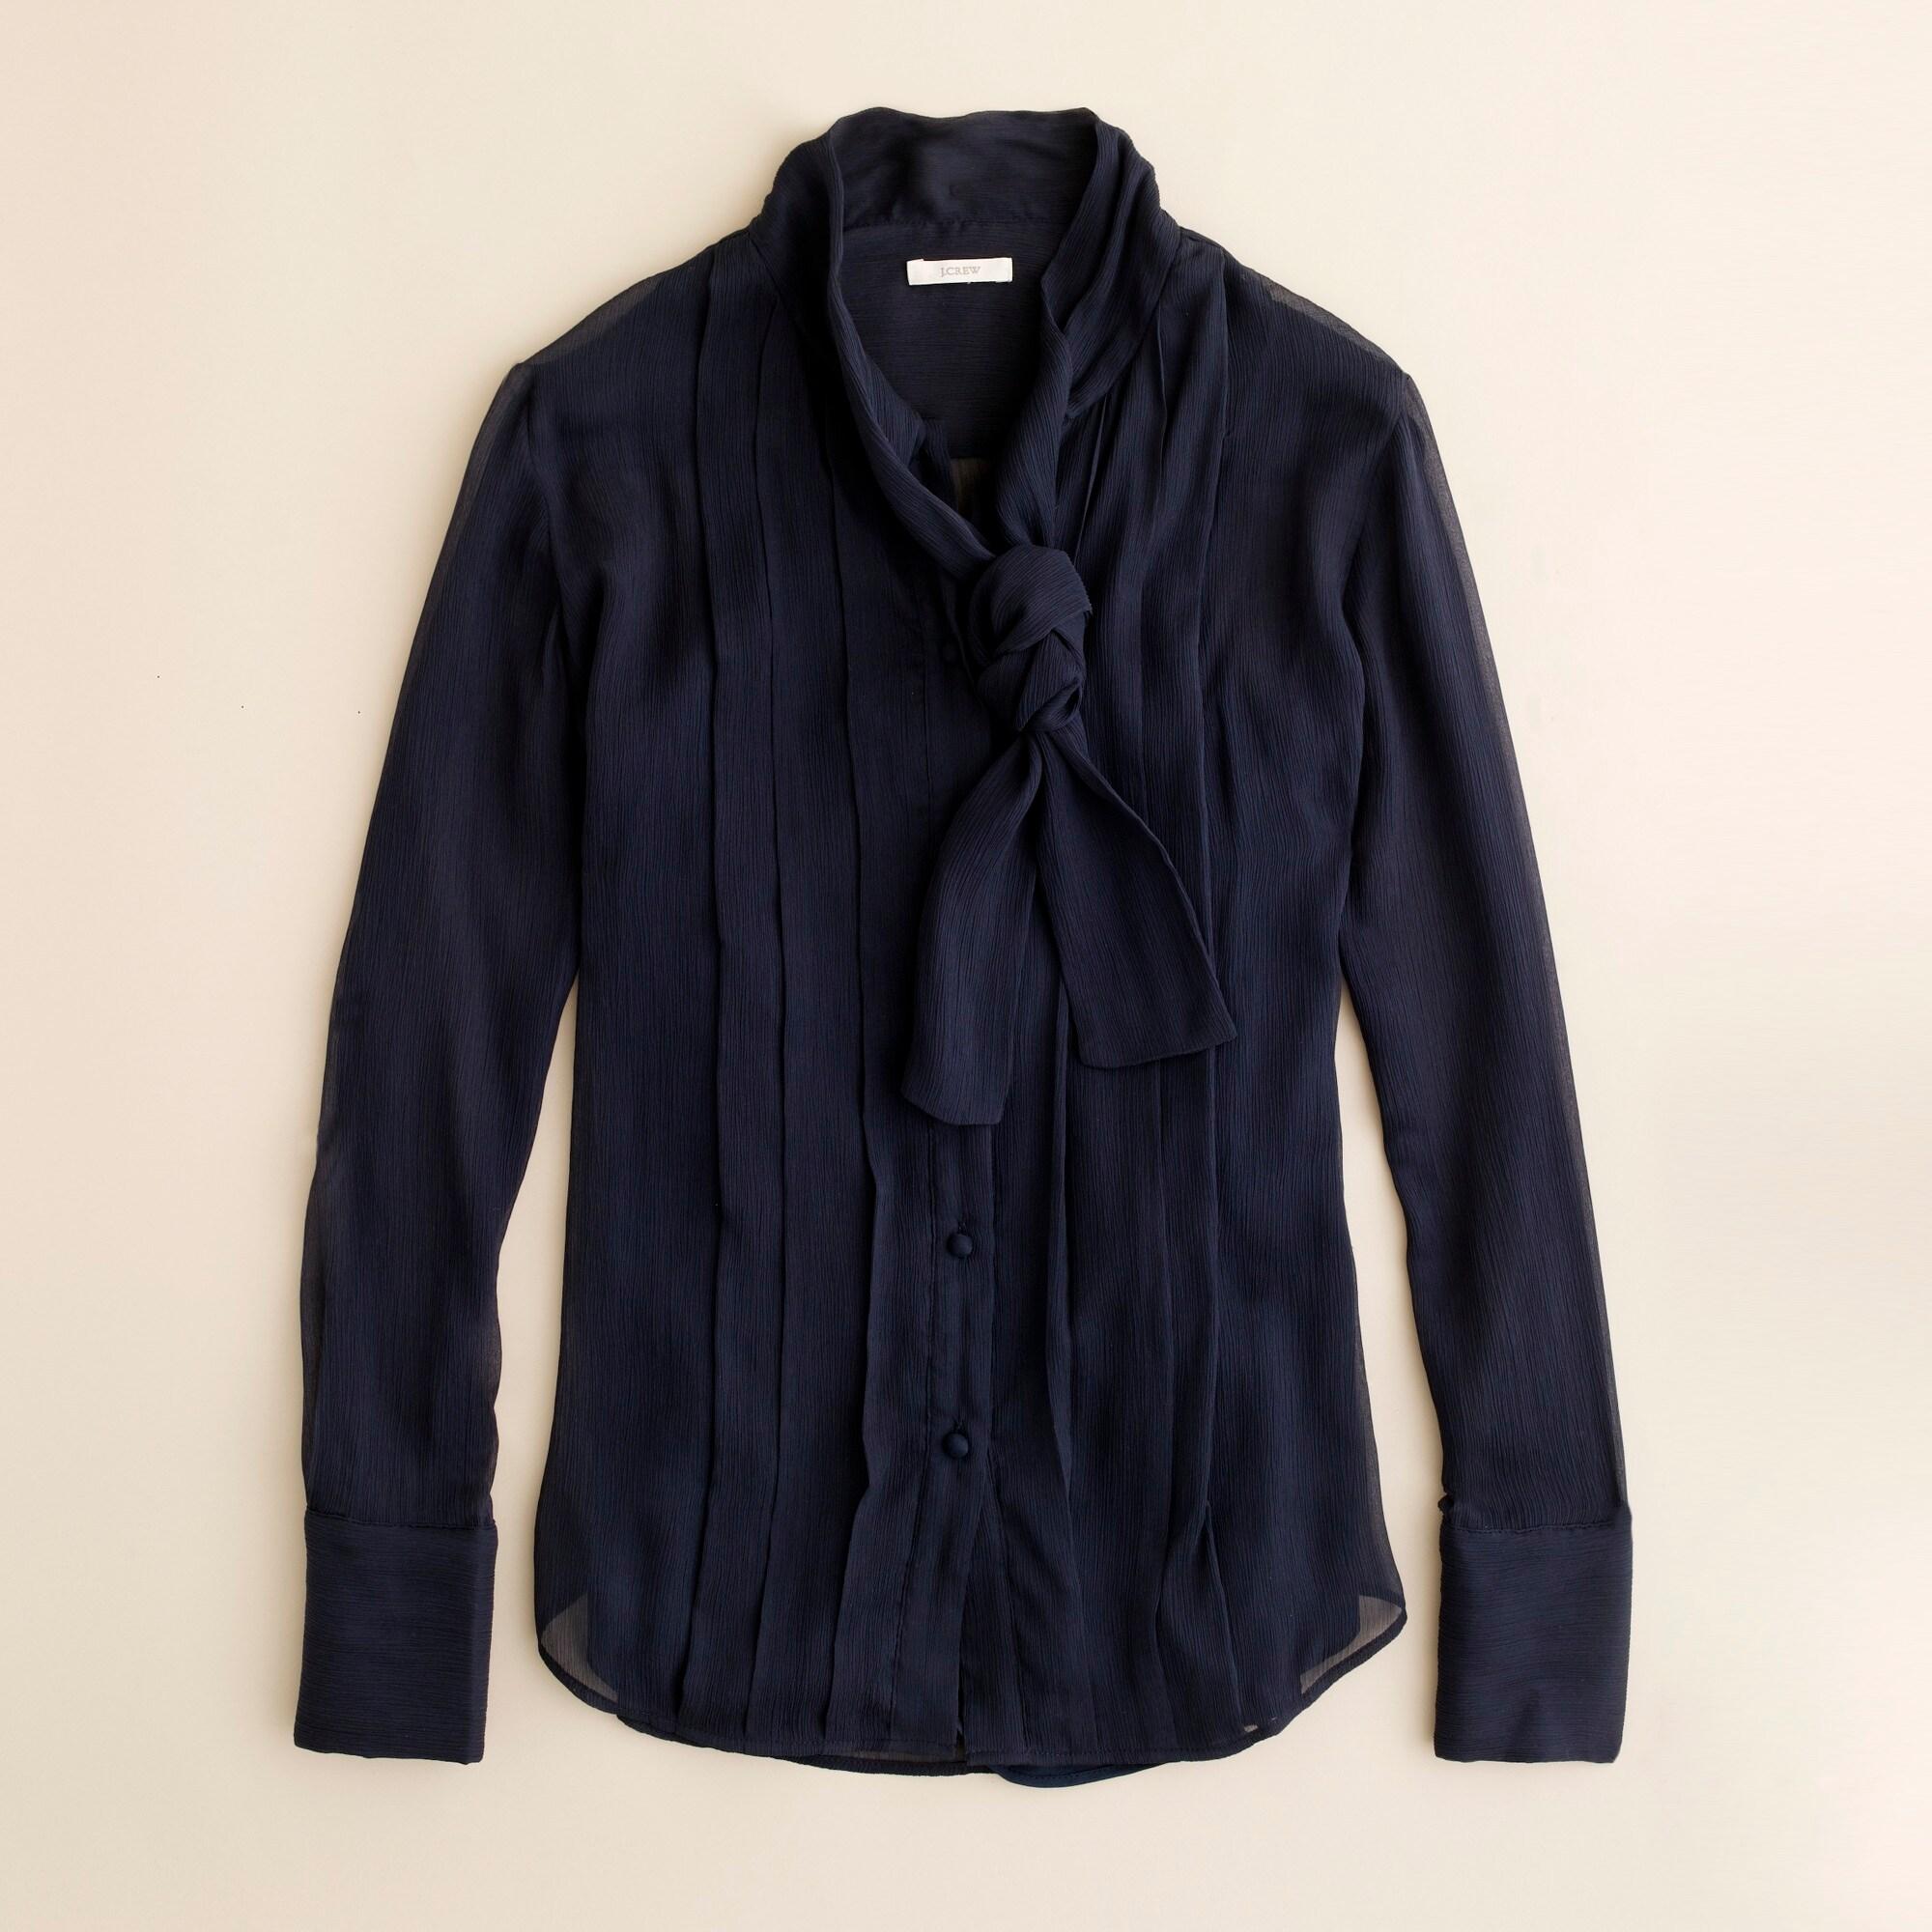 Image 2 for Suzette blouse